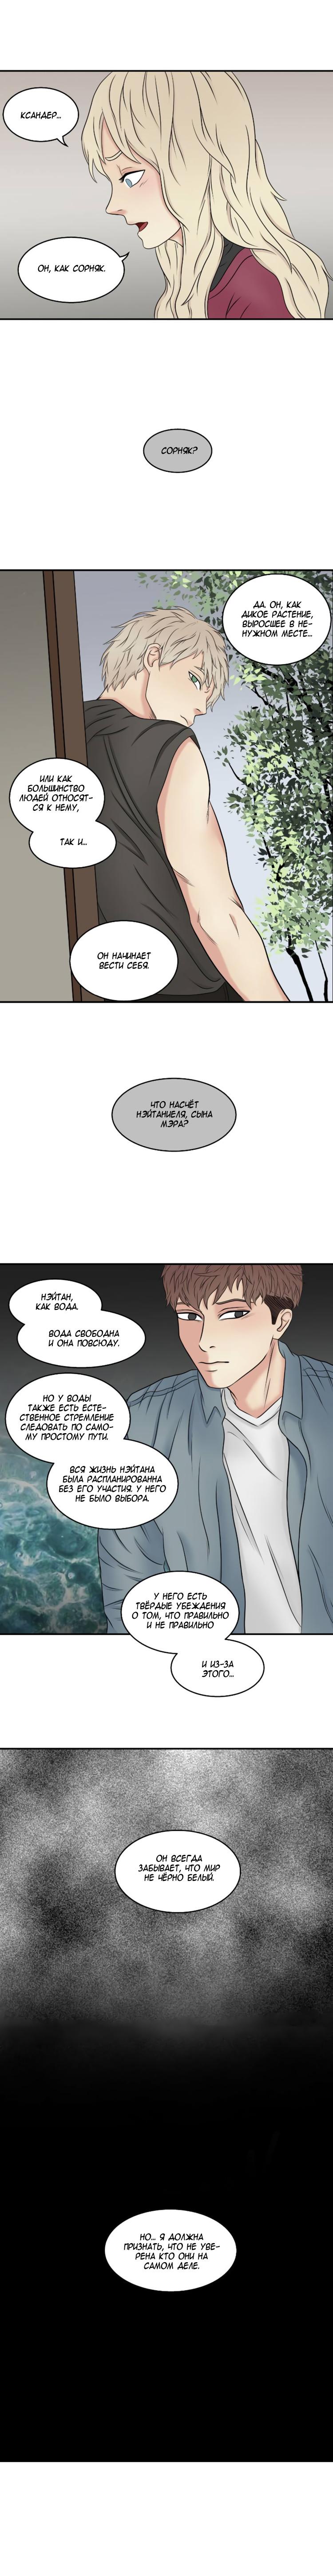 https://r2.ninemanga.com/comics/pic3/21/33557/1298593/1546974997161.jpg Page 3